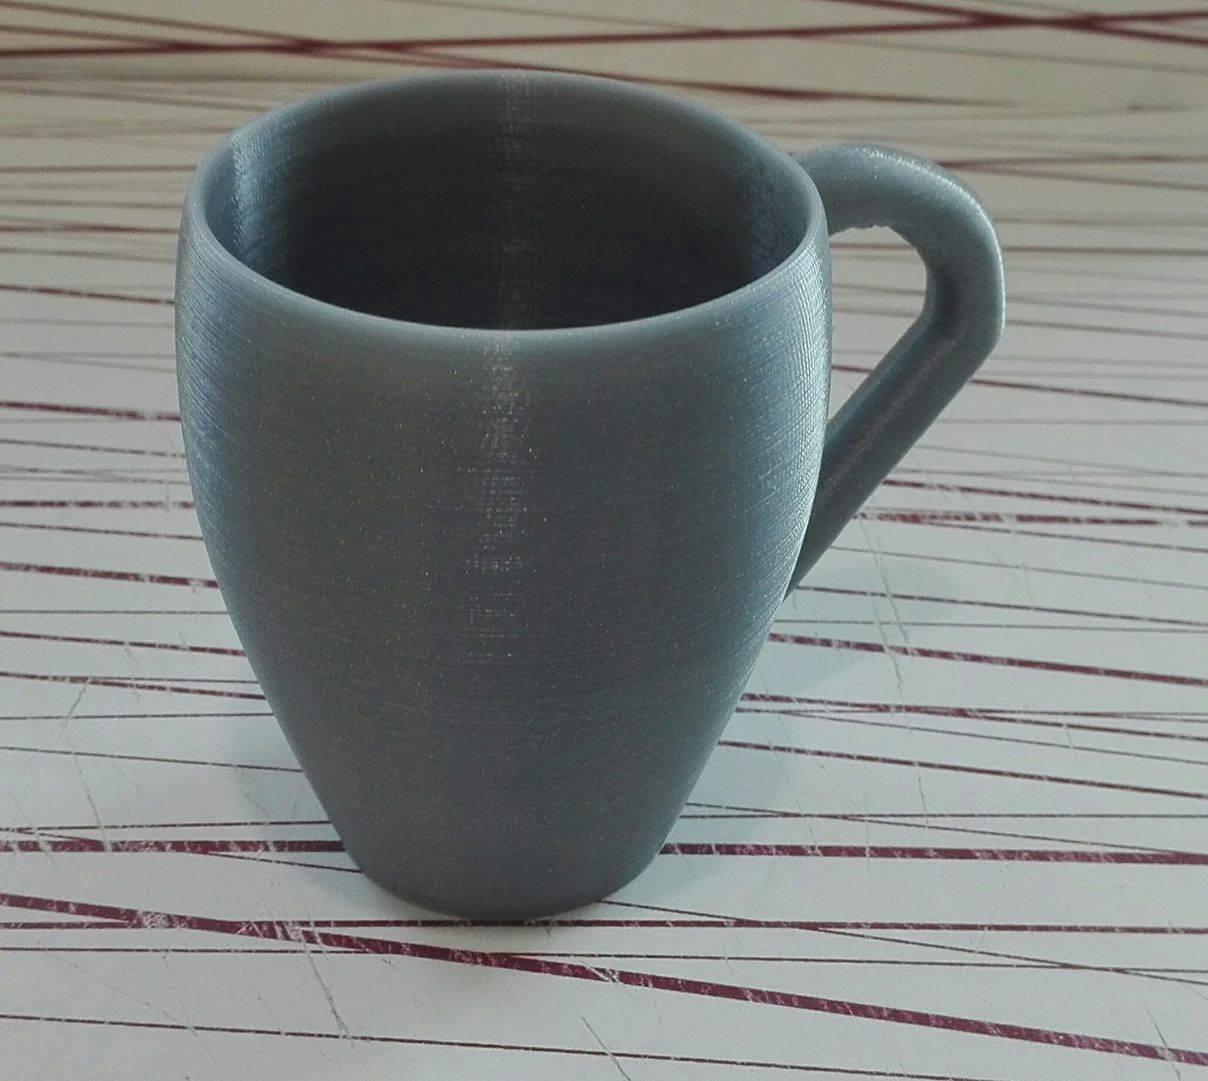 5.jpg Download free STL file Animal cups • Design to 3D print, Rudddy